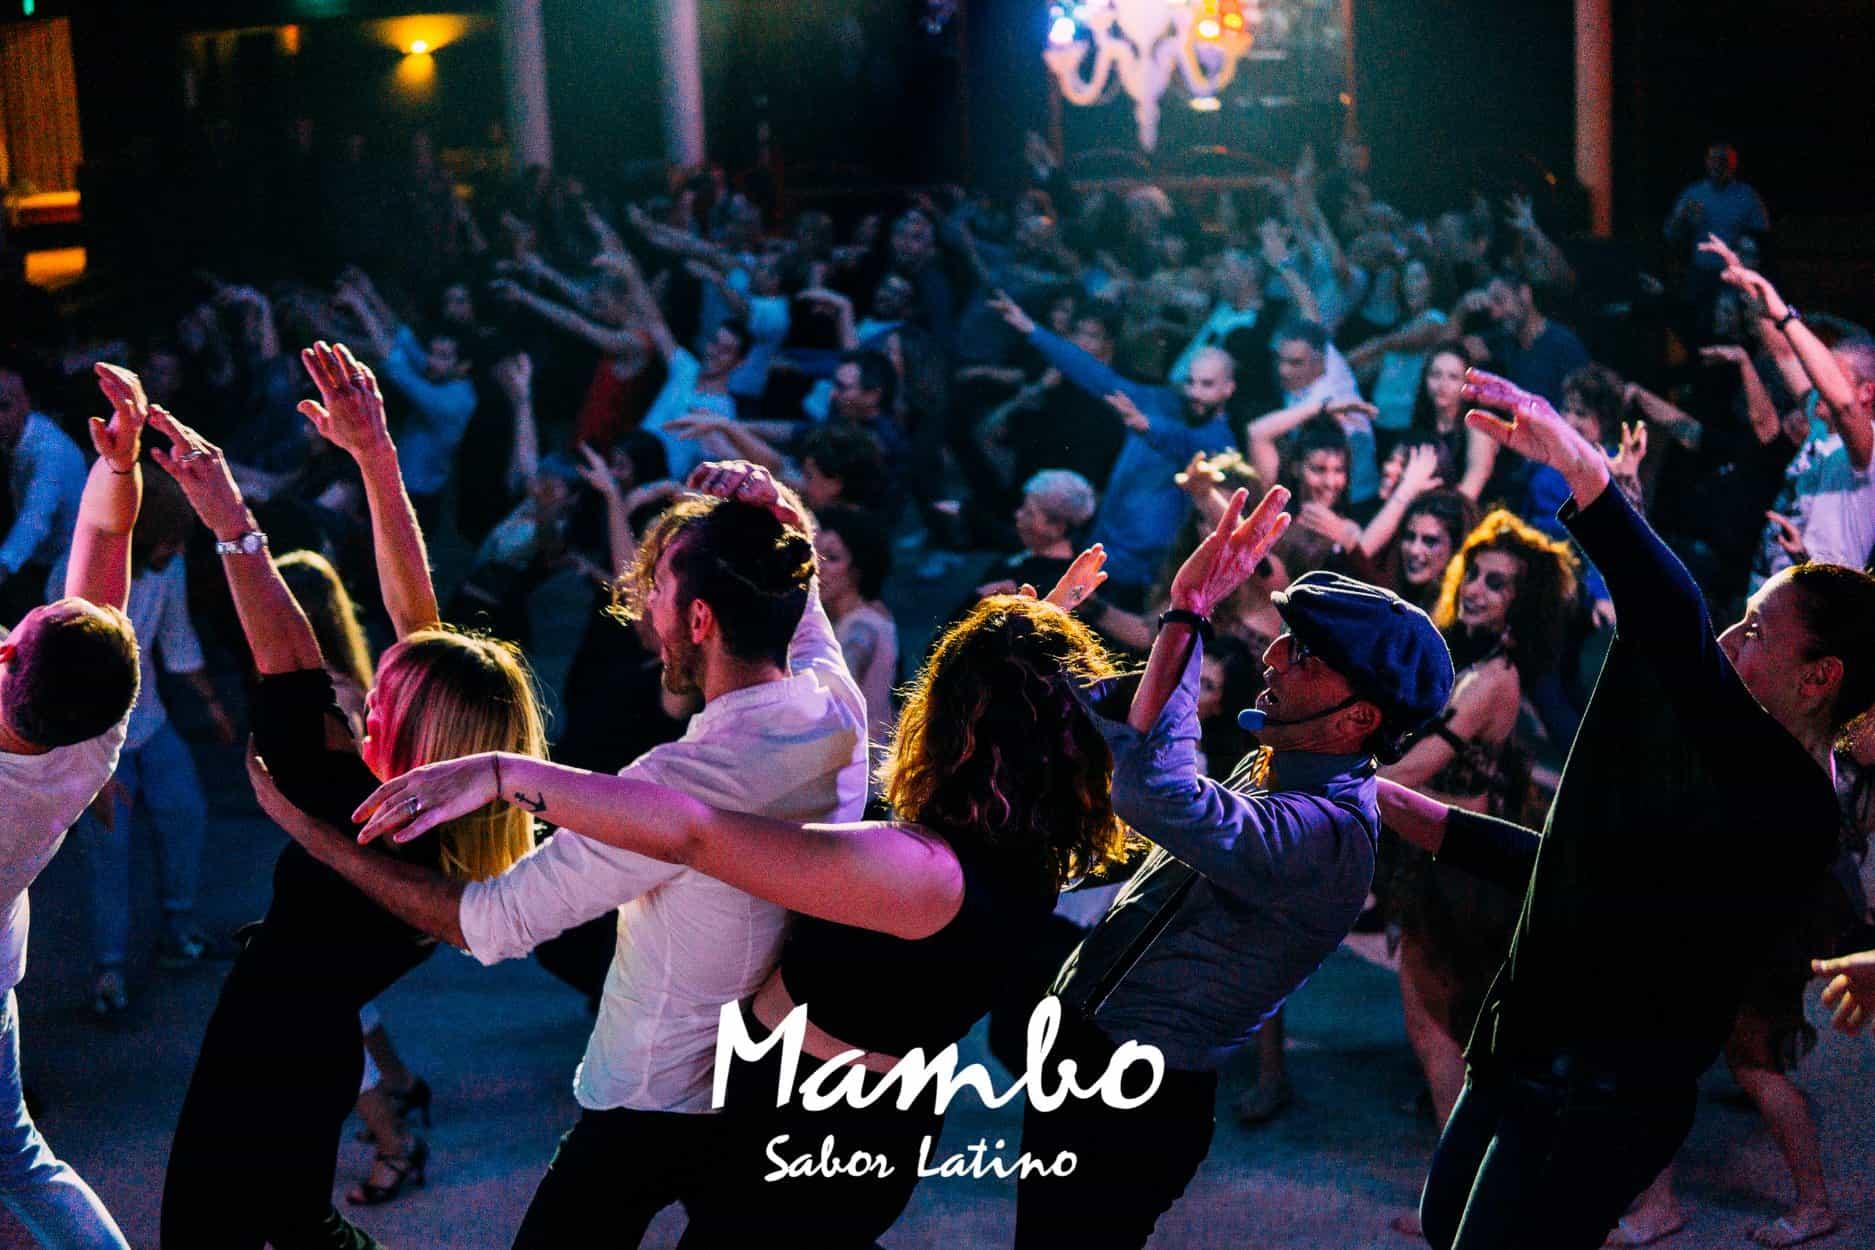 Mambo Sabor Latino